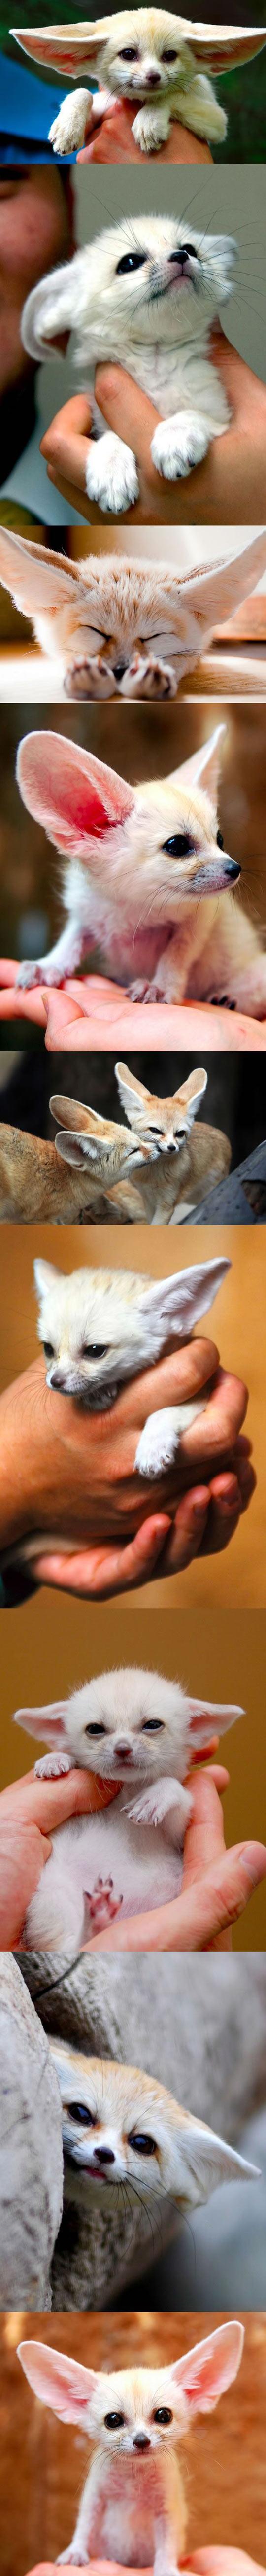 Fennec Fox Appreciation Post